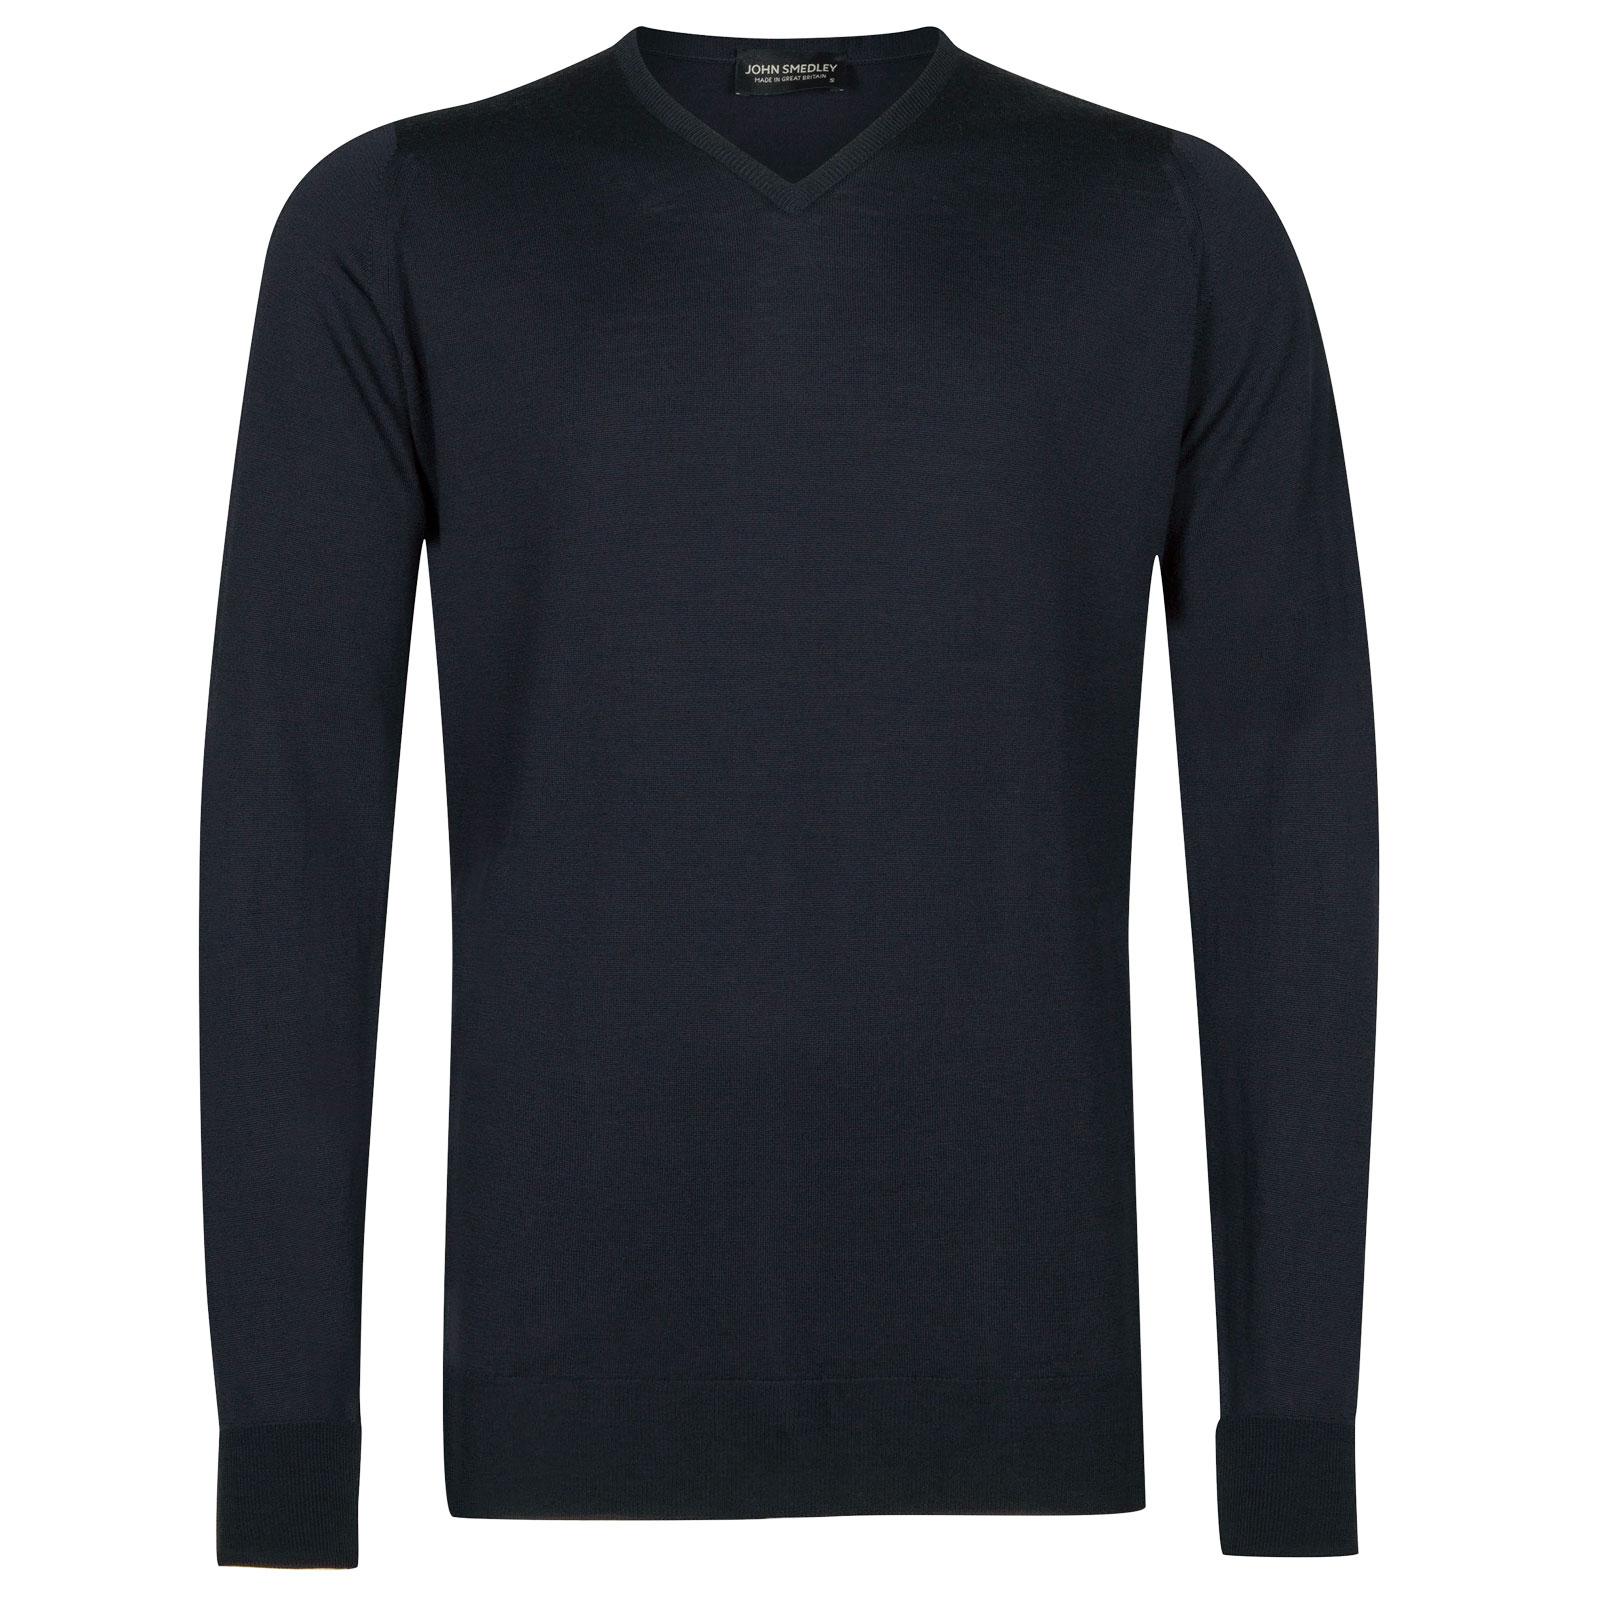 John Smedley shipton Merino Wool Pullover in Midnight-XXL